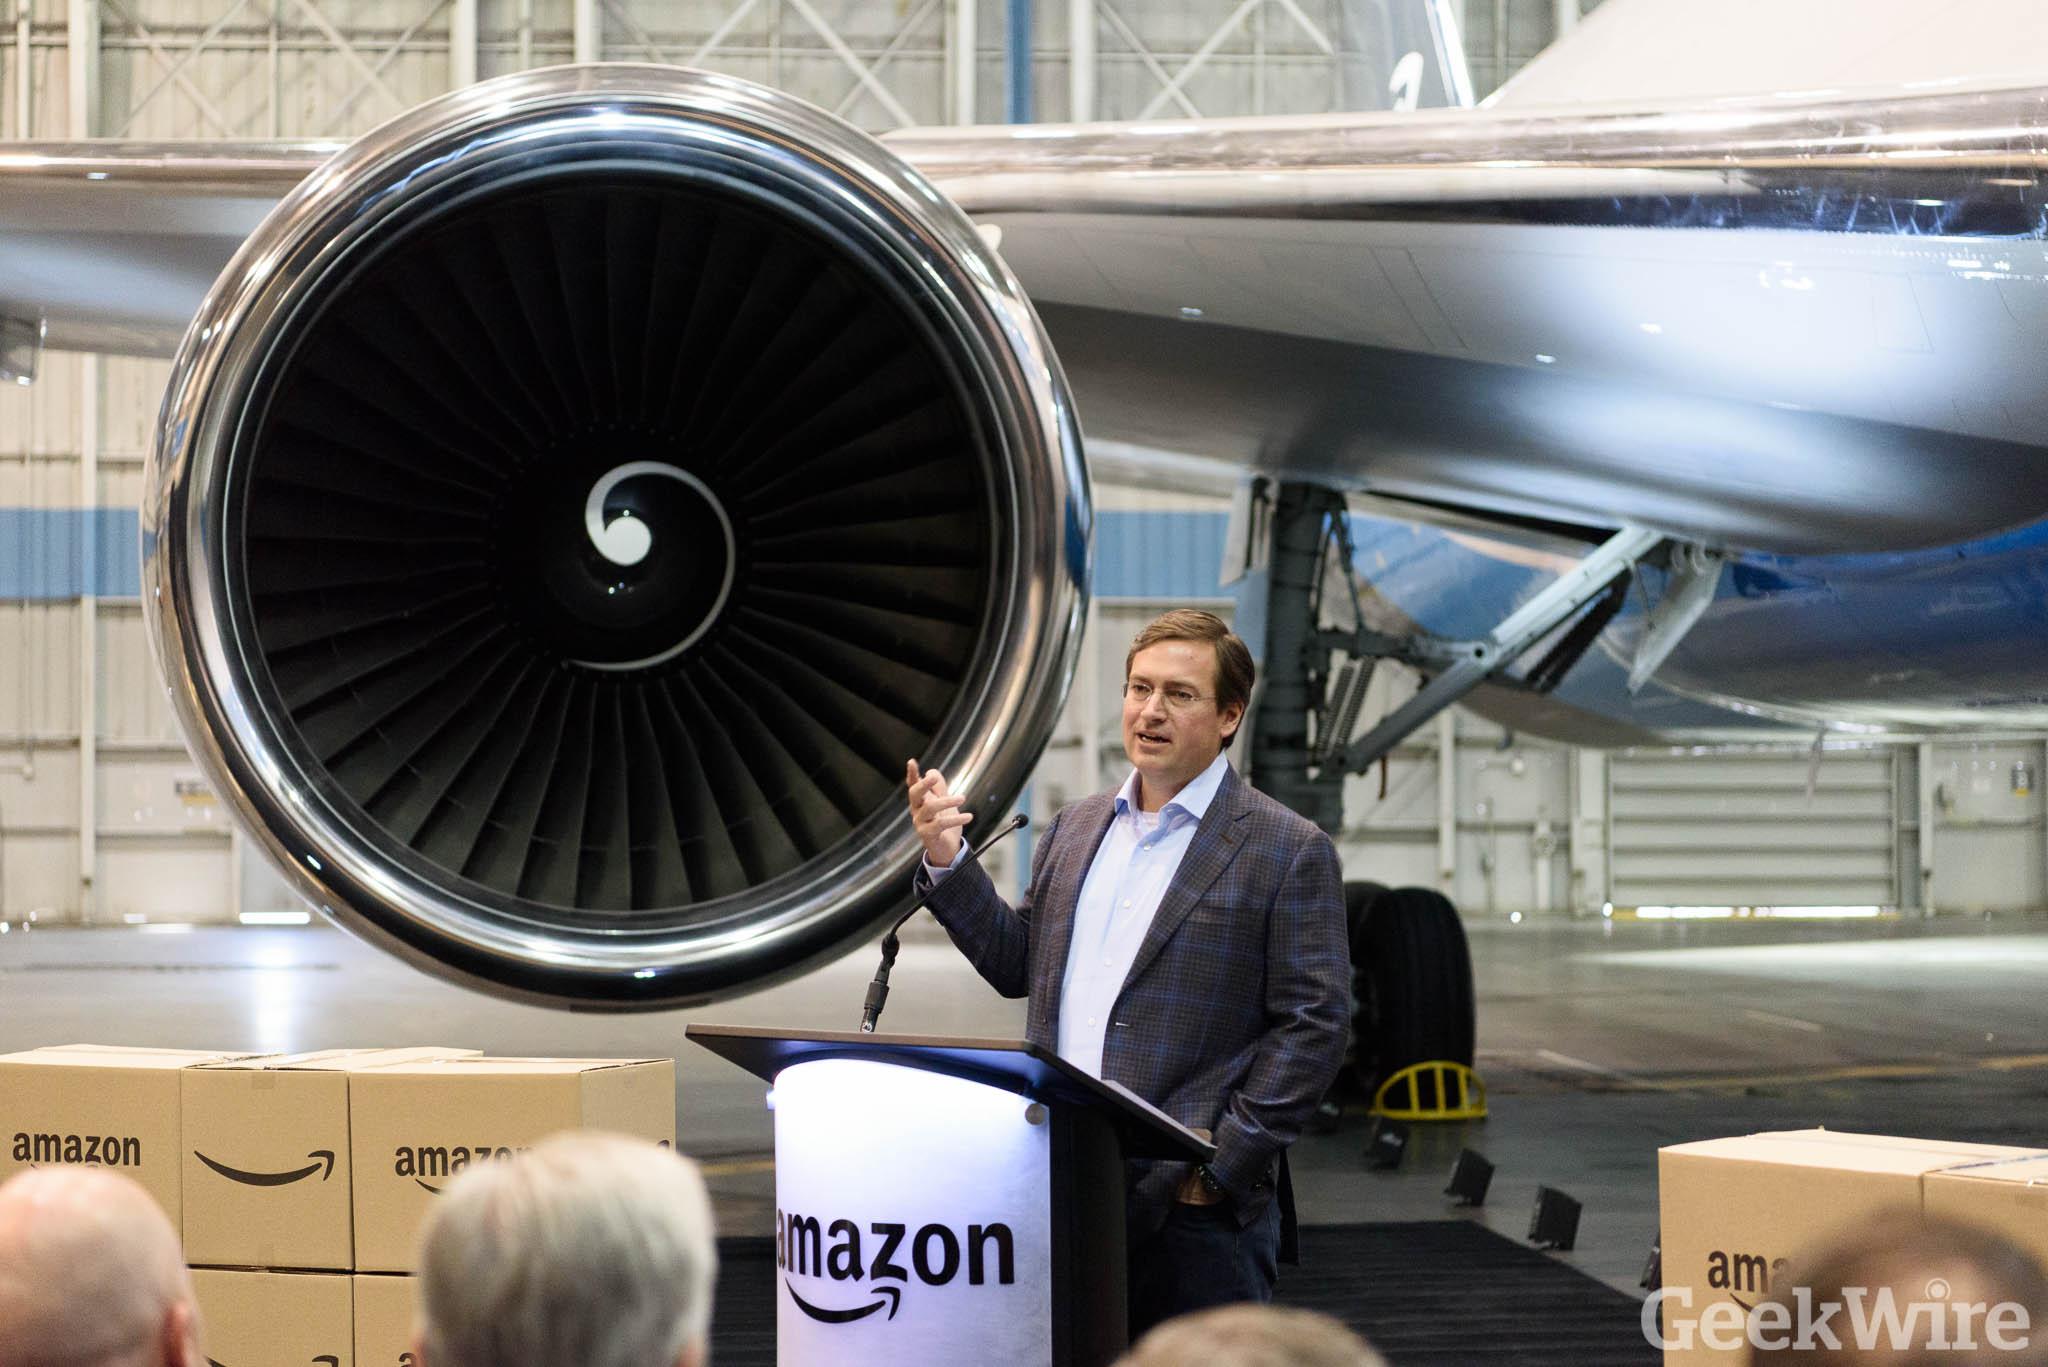 Amazon Prime airplane debuts after secret night flight